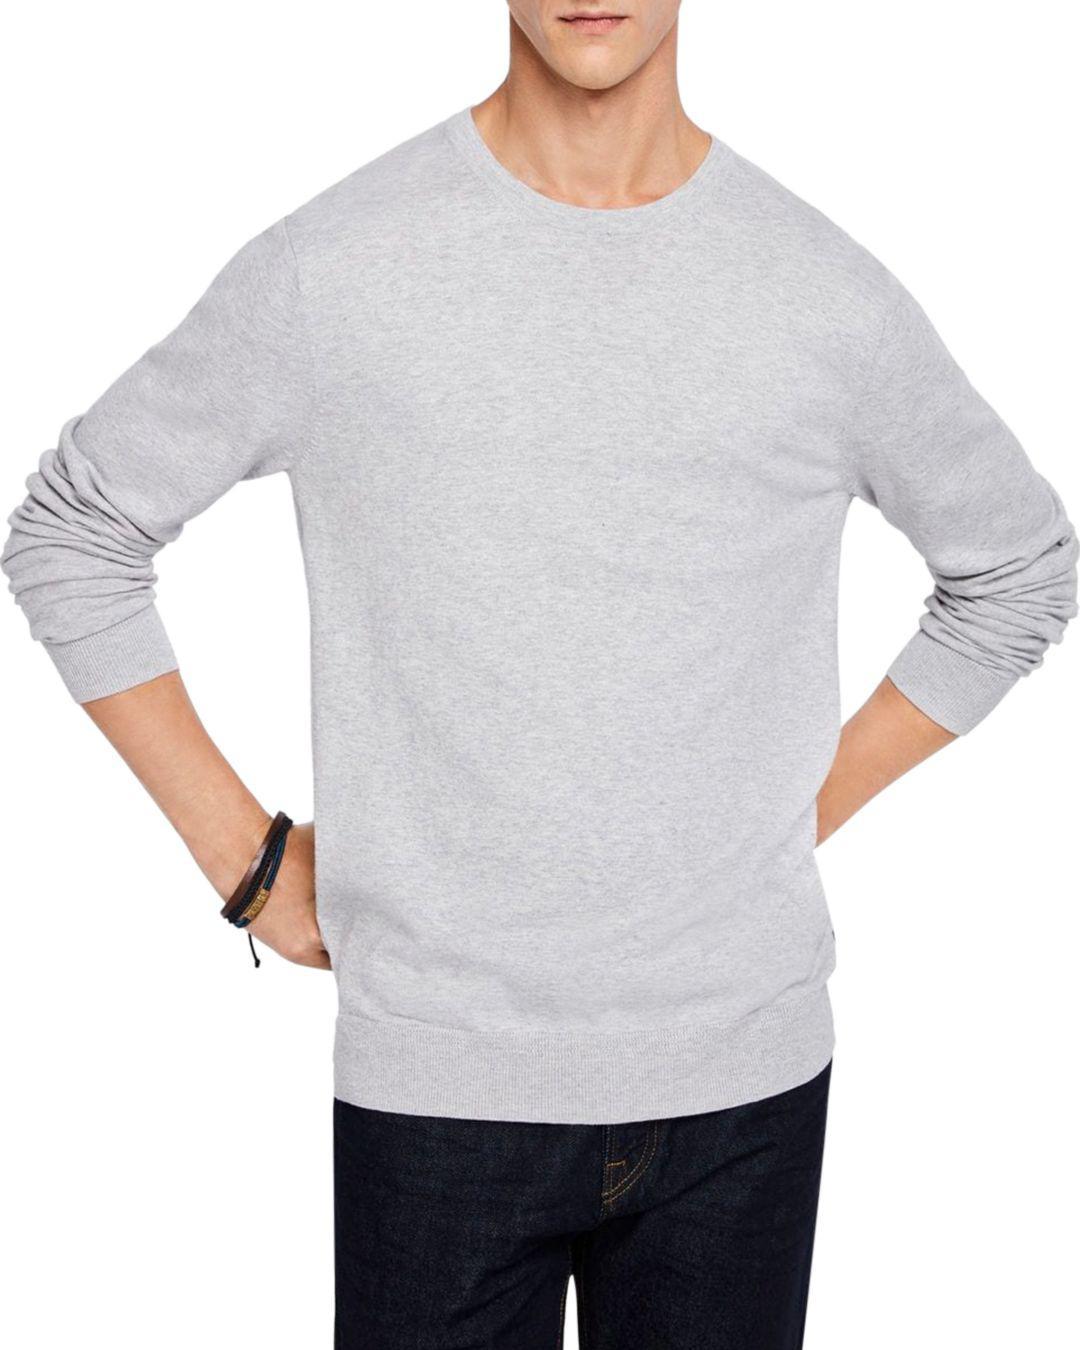 c0d1aca70 Lyst - Scotch & Soda Crewneck Sweater in Gray for Men